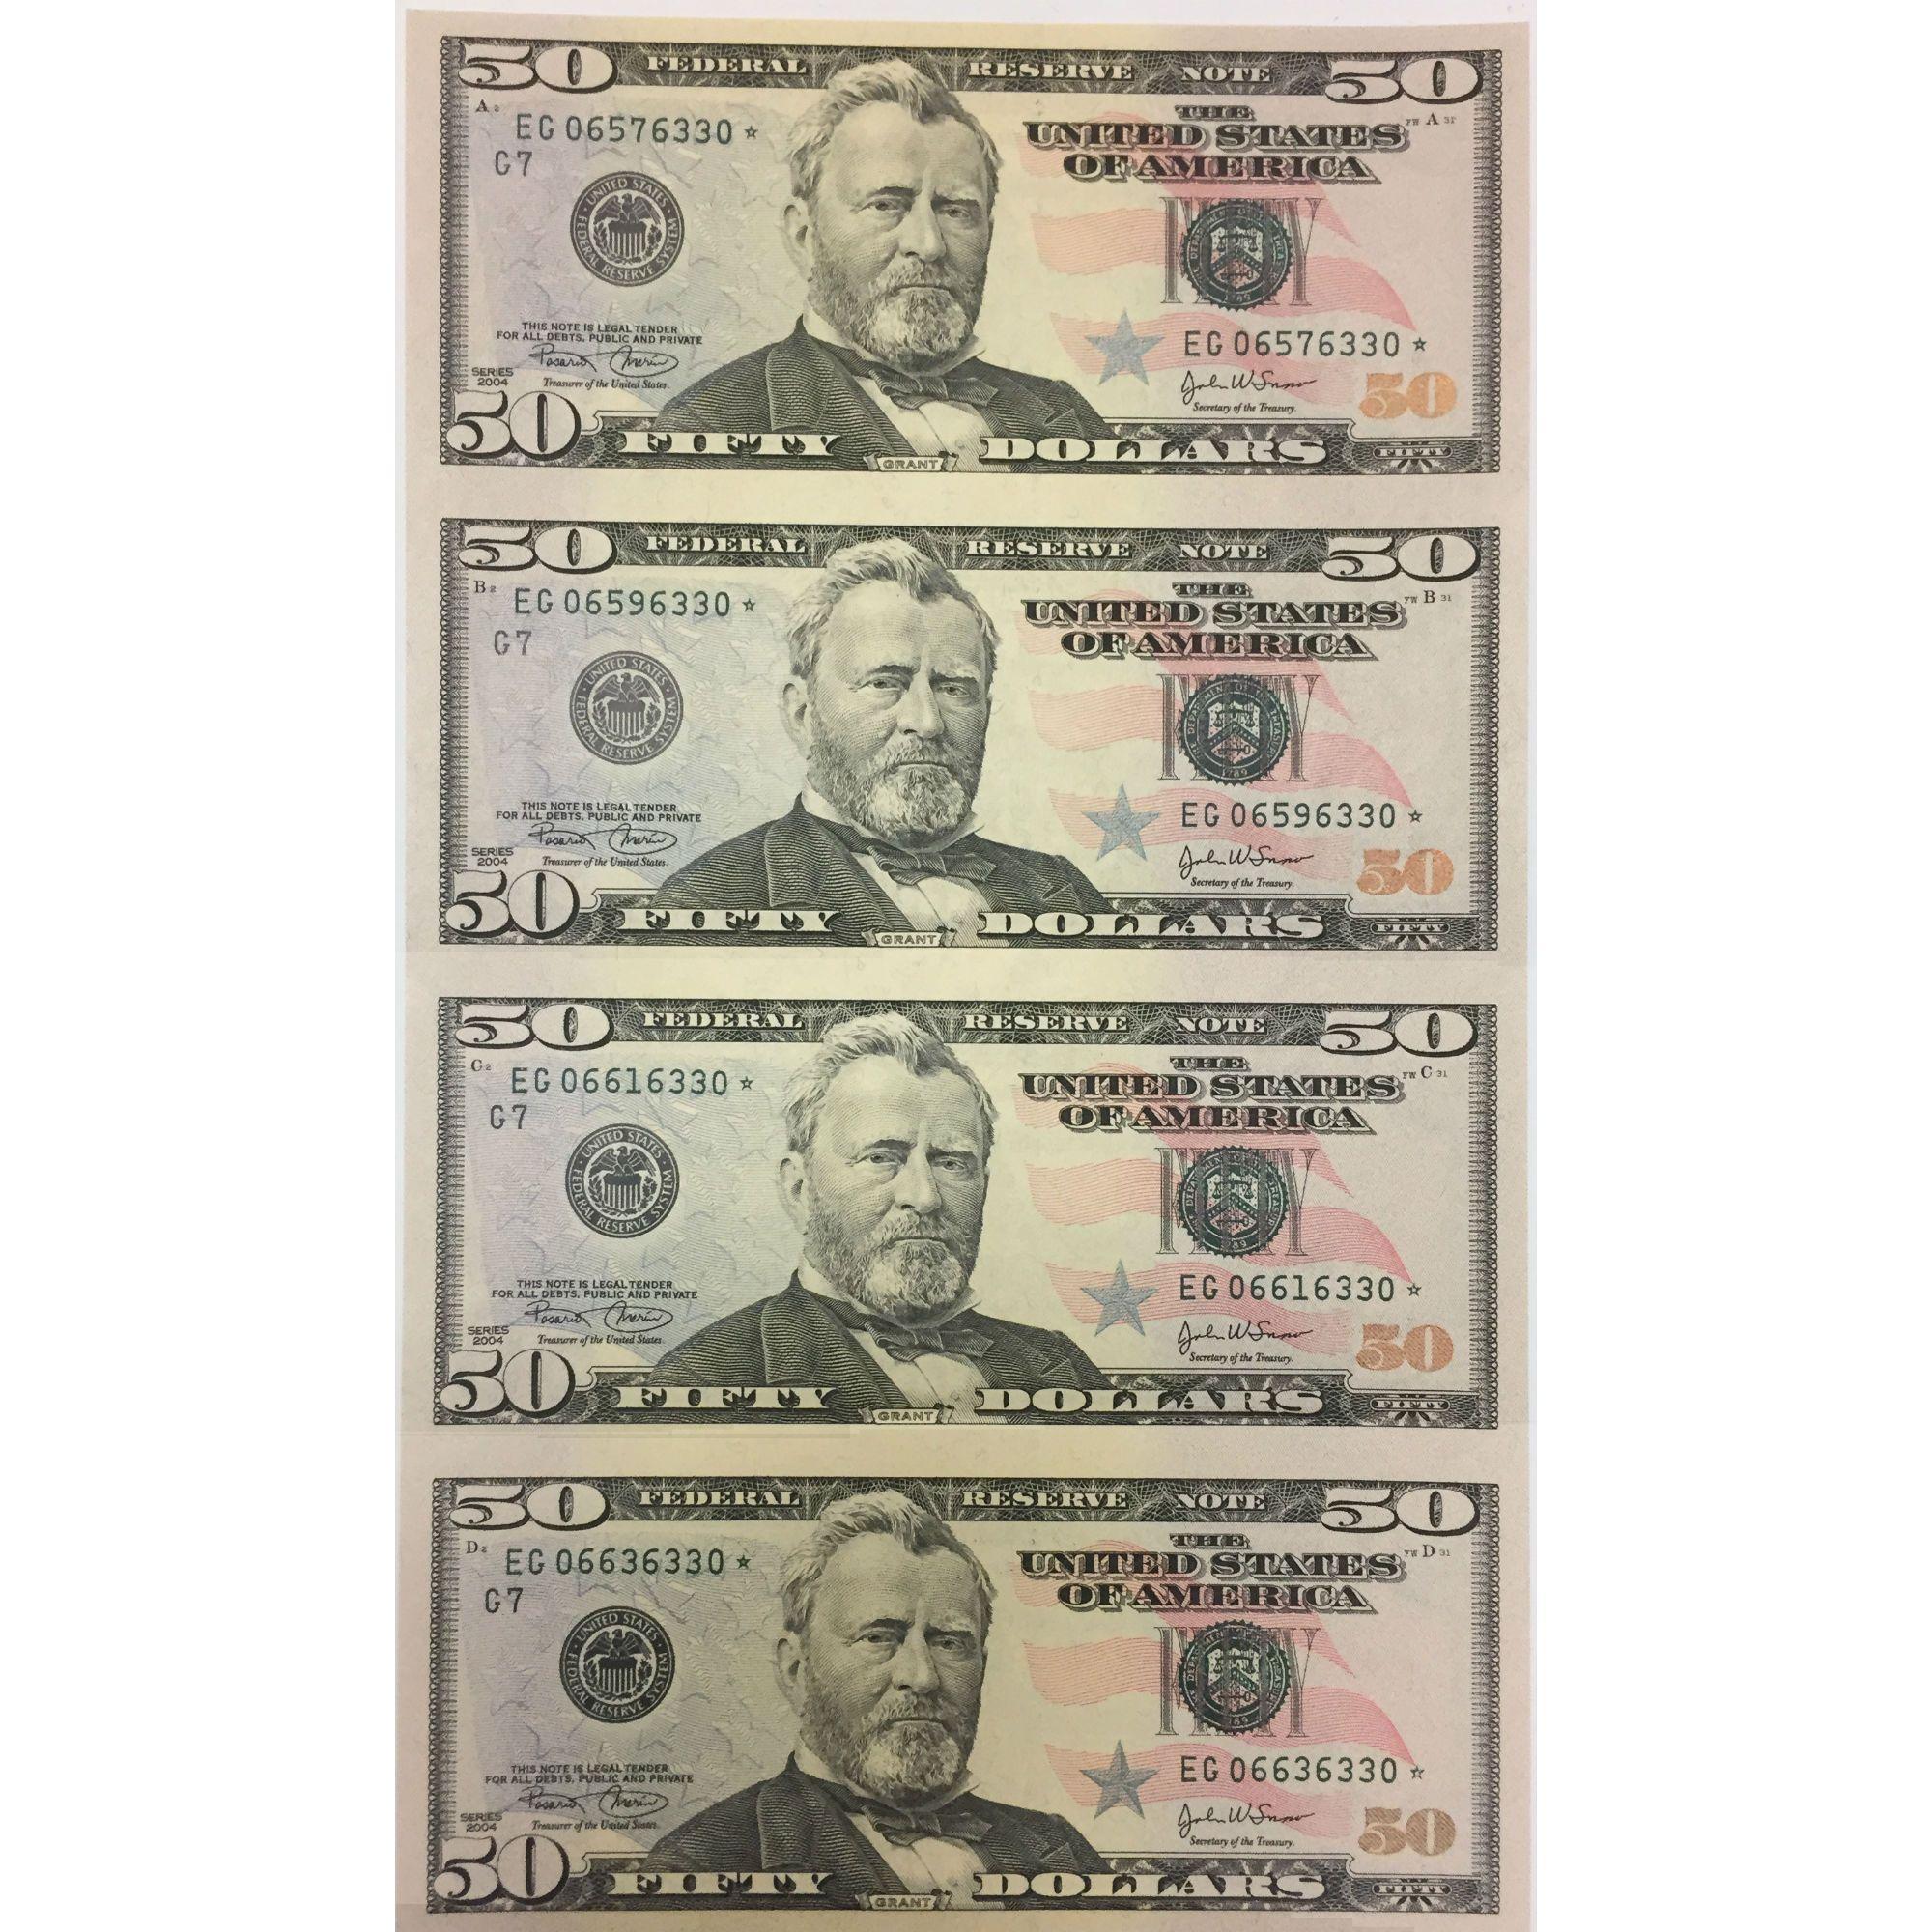 Uncut currency sheet 4 x 50 2004 star unc bullion coins